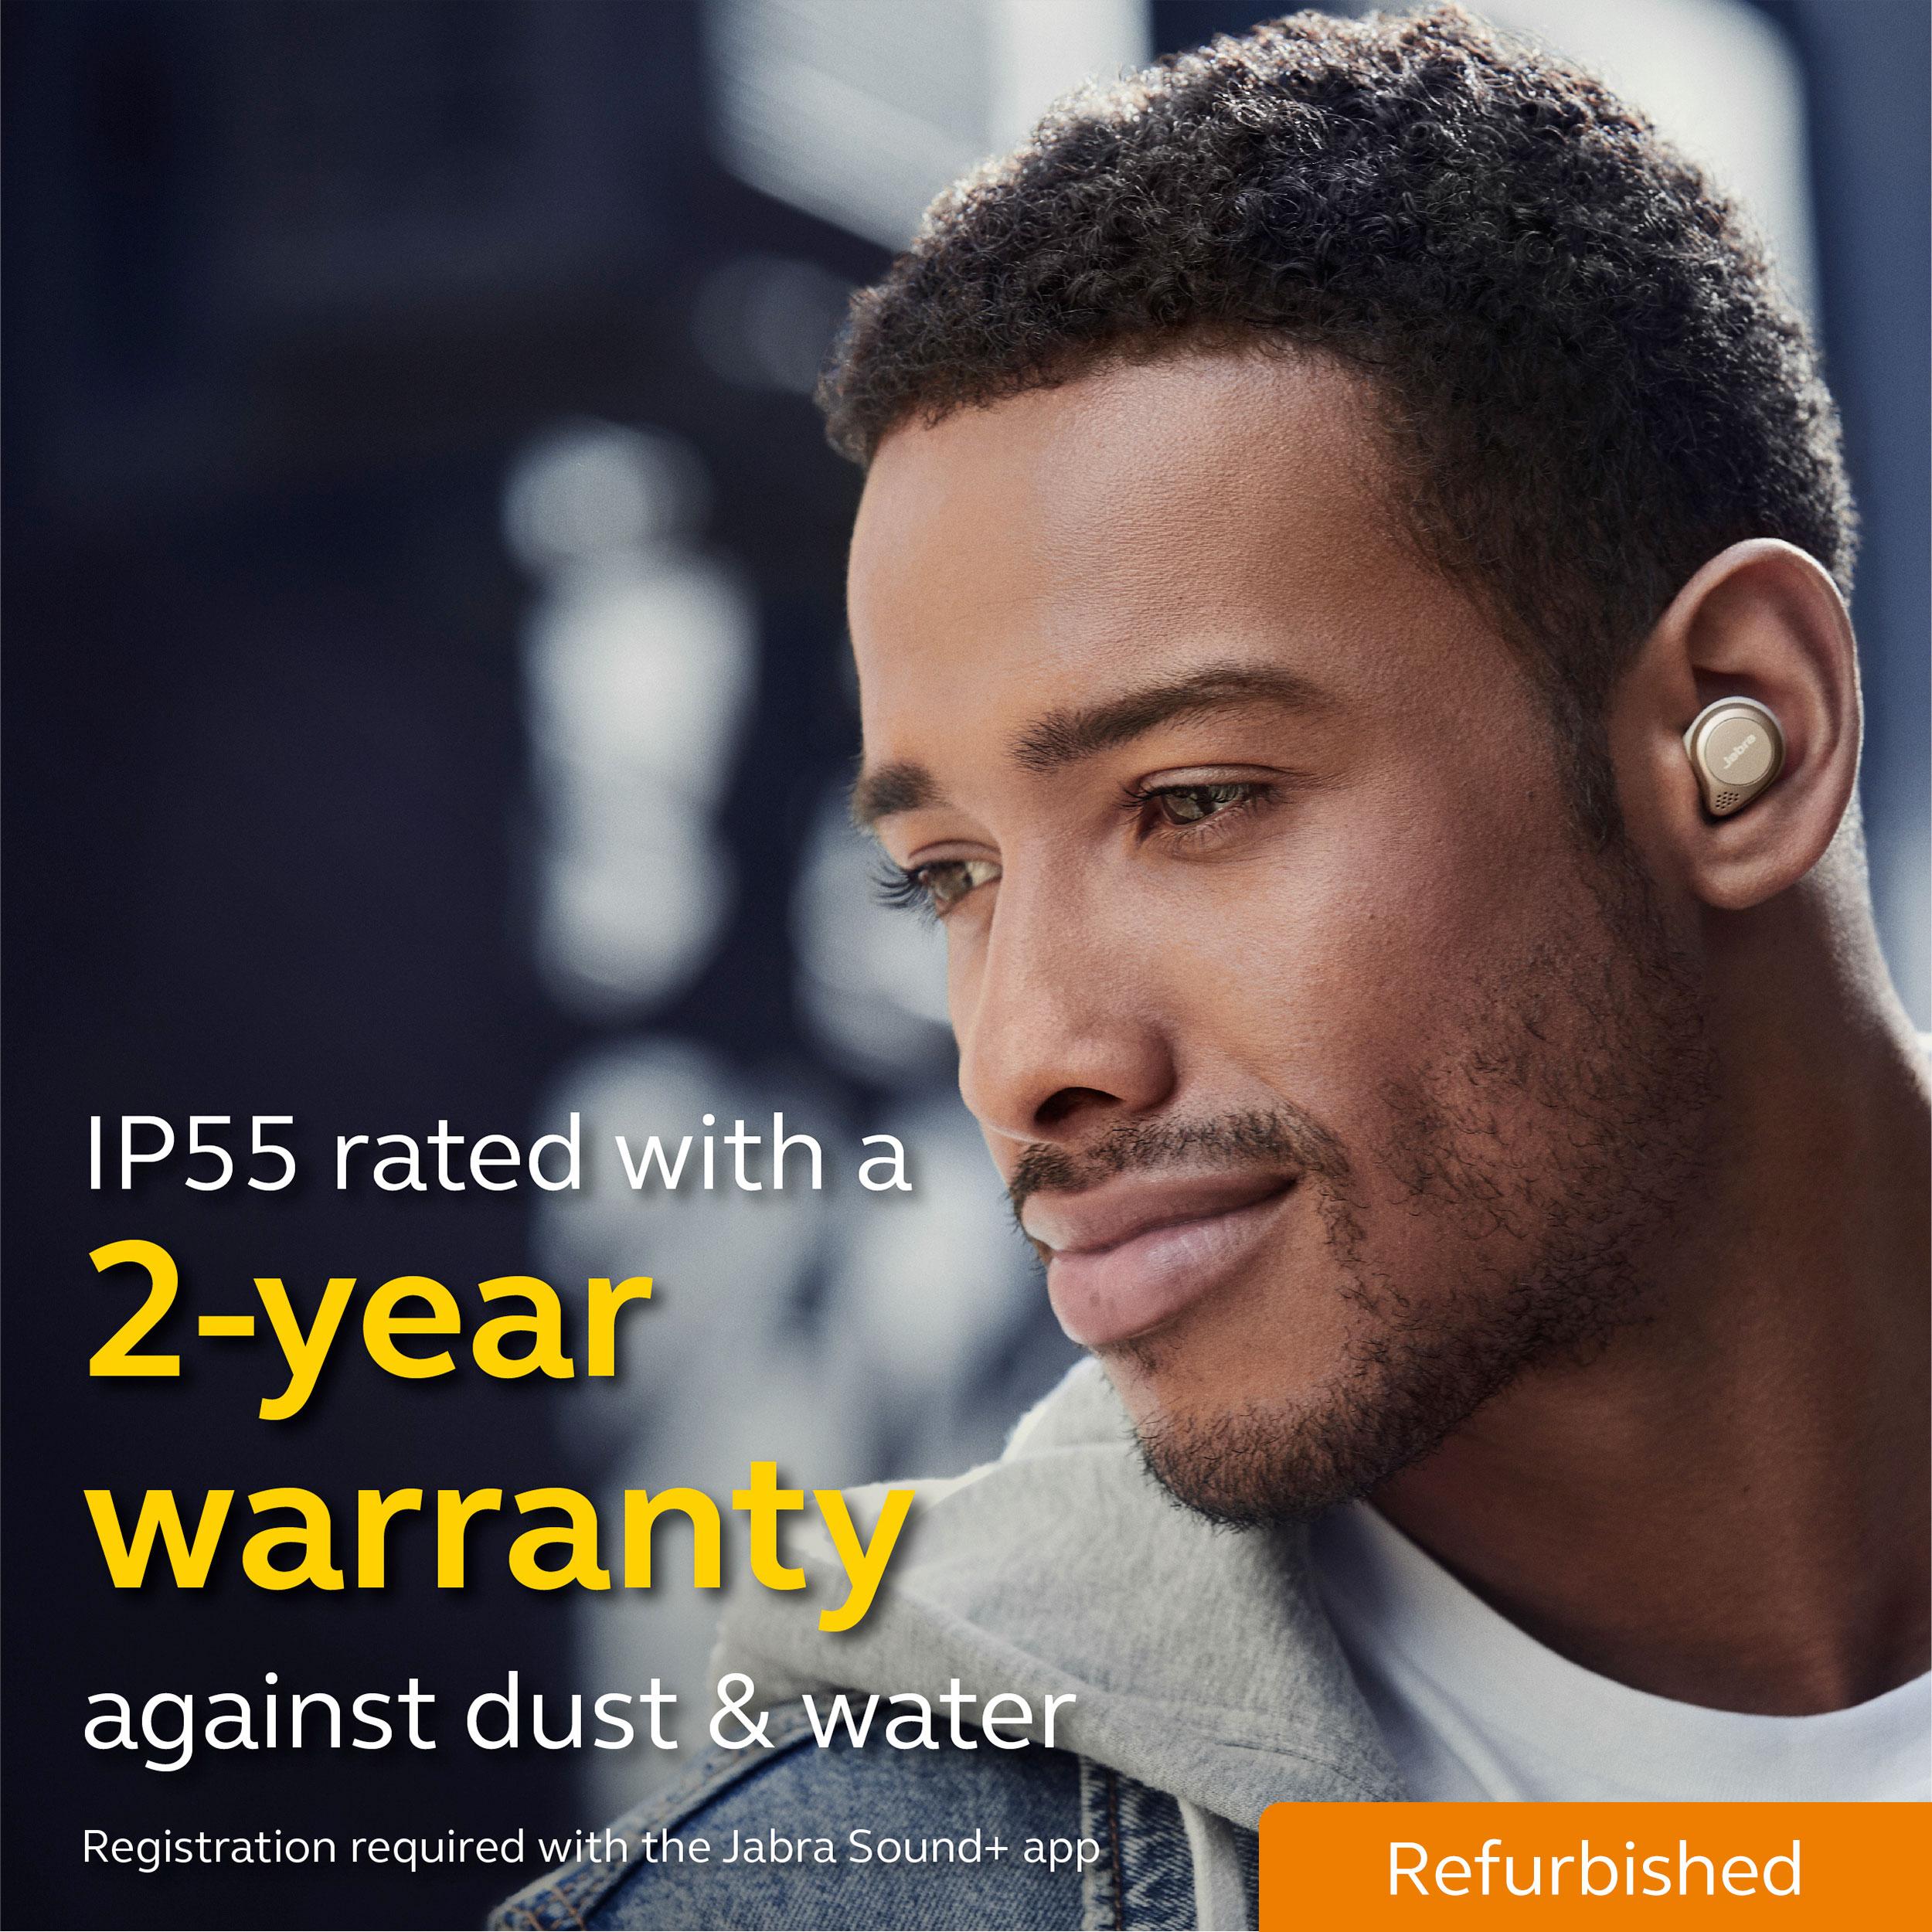 Jabra-Elite-75t-Voice-Assistant-True-Wireless-earbuds-Manufacturer-Refurbished thumbnail 14